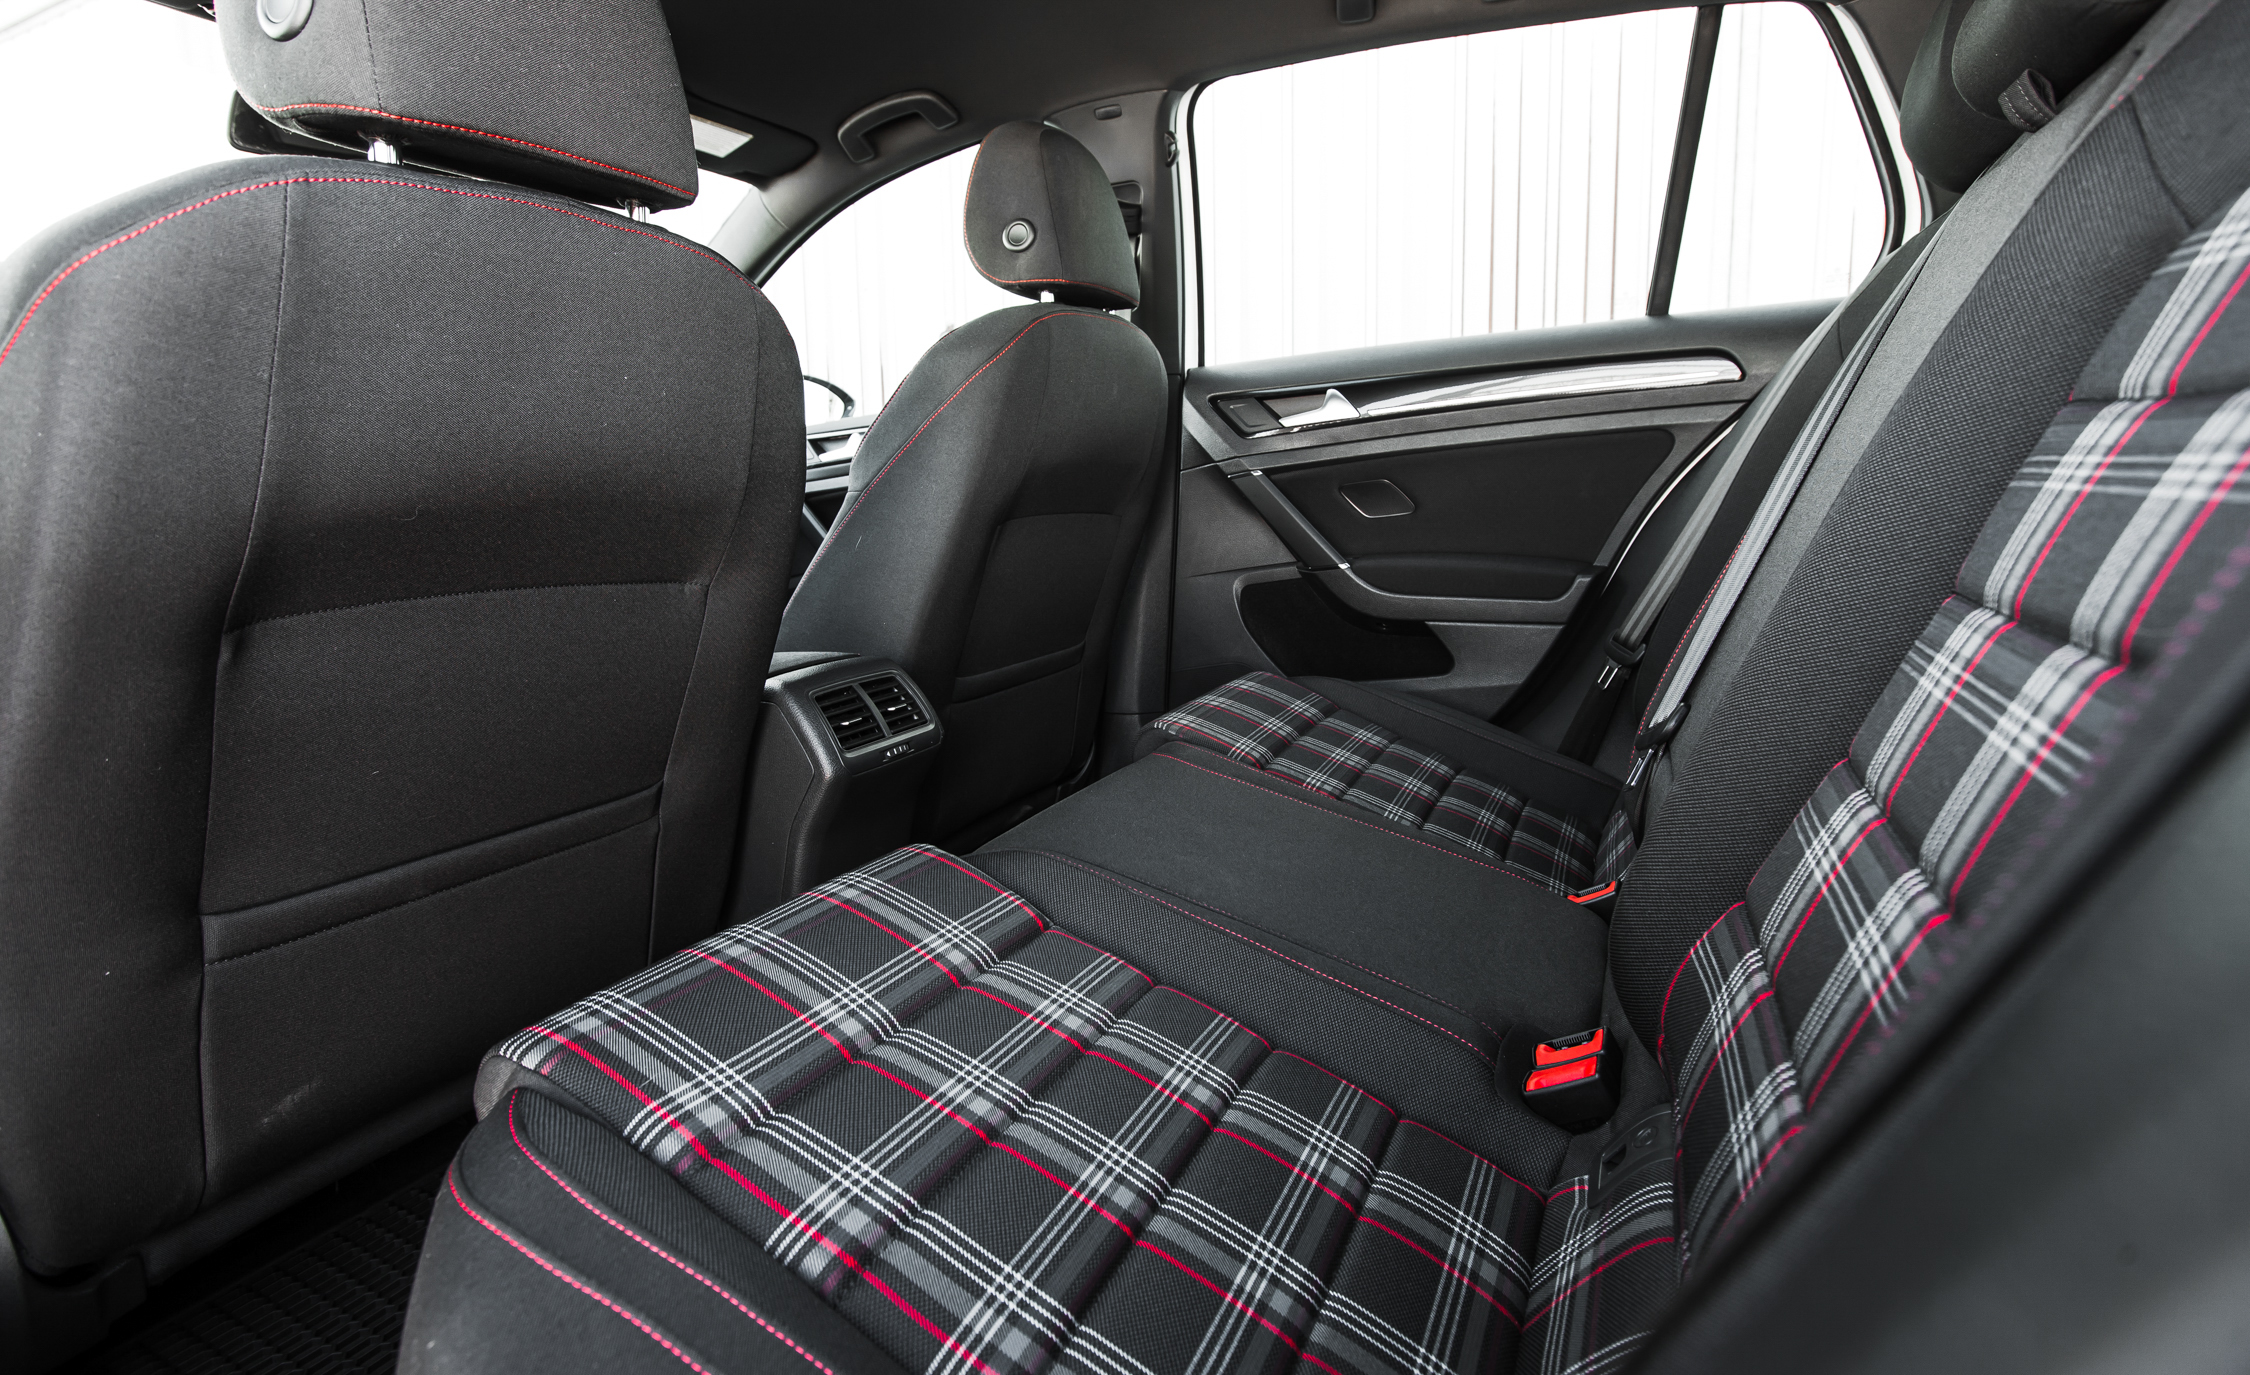 2015 Volkswagen GTI Interior Rear